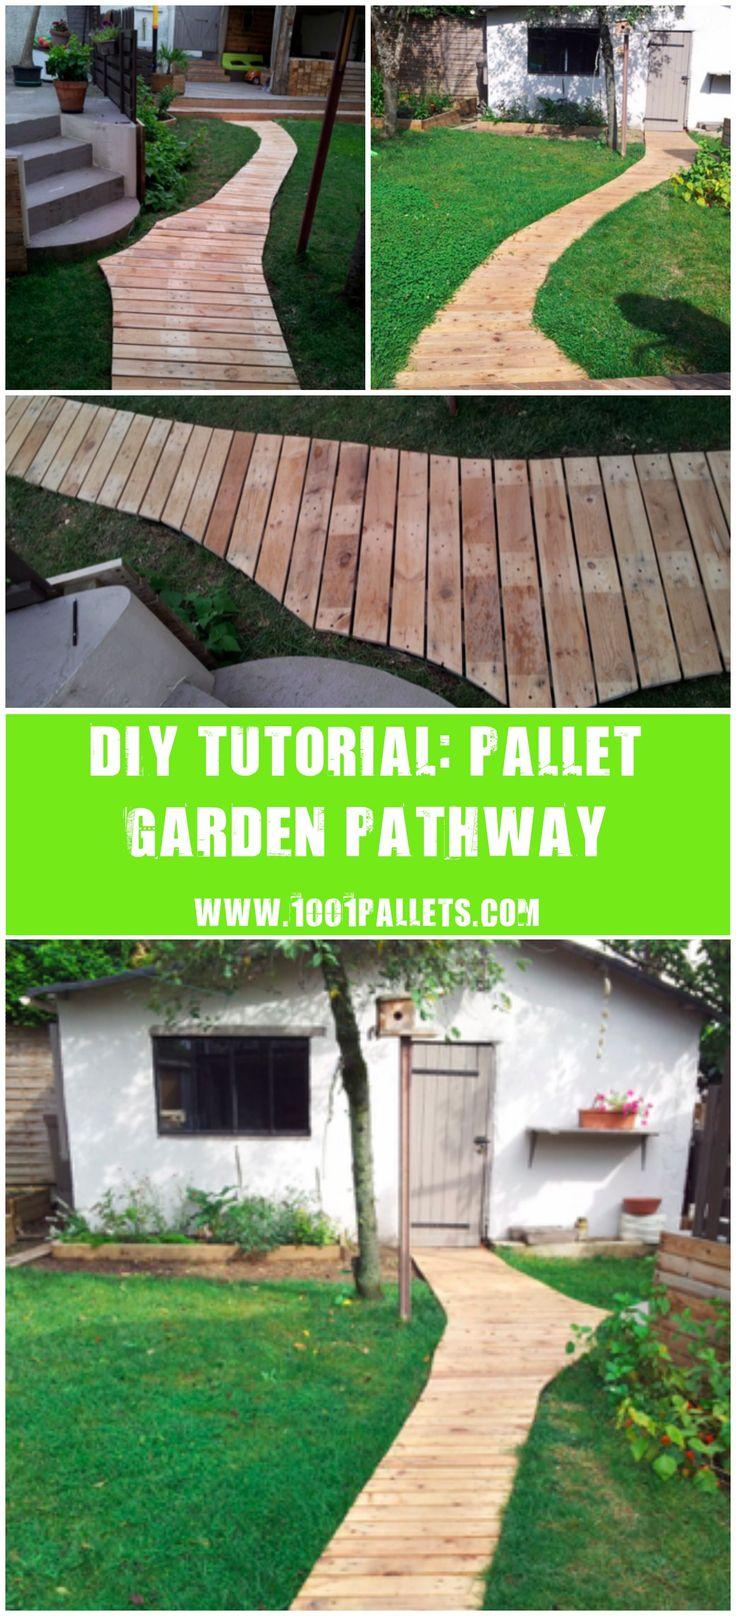 Epsom decking over a raised eyesore ashwell landscapes - Diy Pdf Tutorial Pallet Garden Pathway 1001 Pallets Free Download